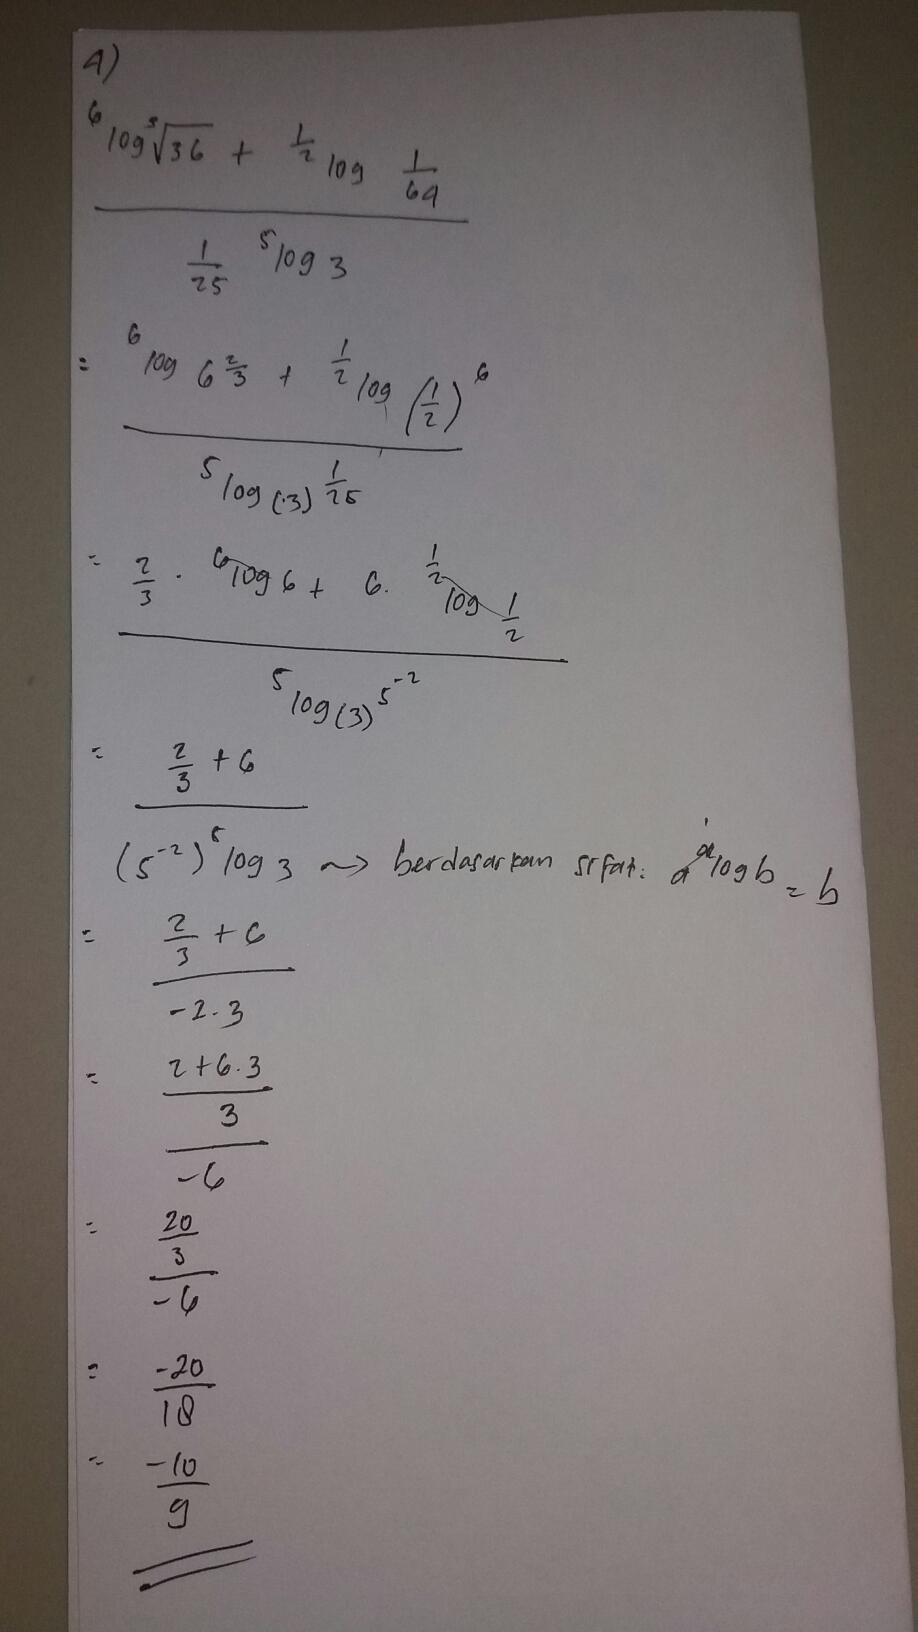 Kunci jawaban pelajaran english, geografi, mathematic game bully. nilai dari 6 log 3 akar 36 + 1/2 log 1/64 per 1/25 5 log 3